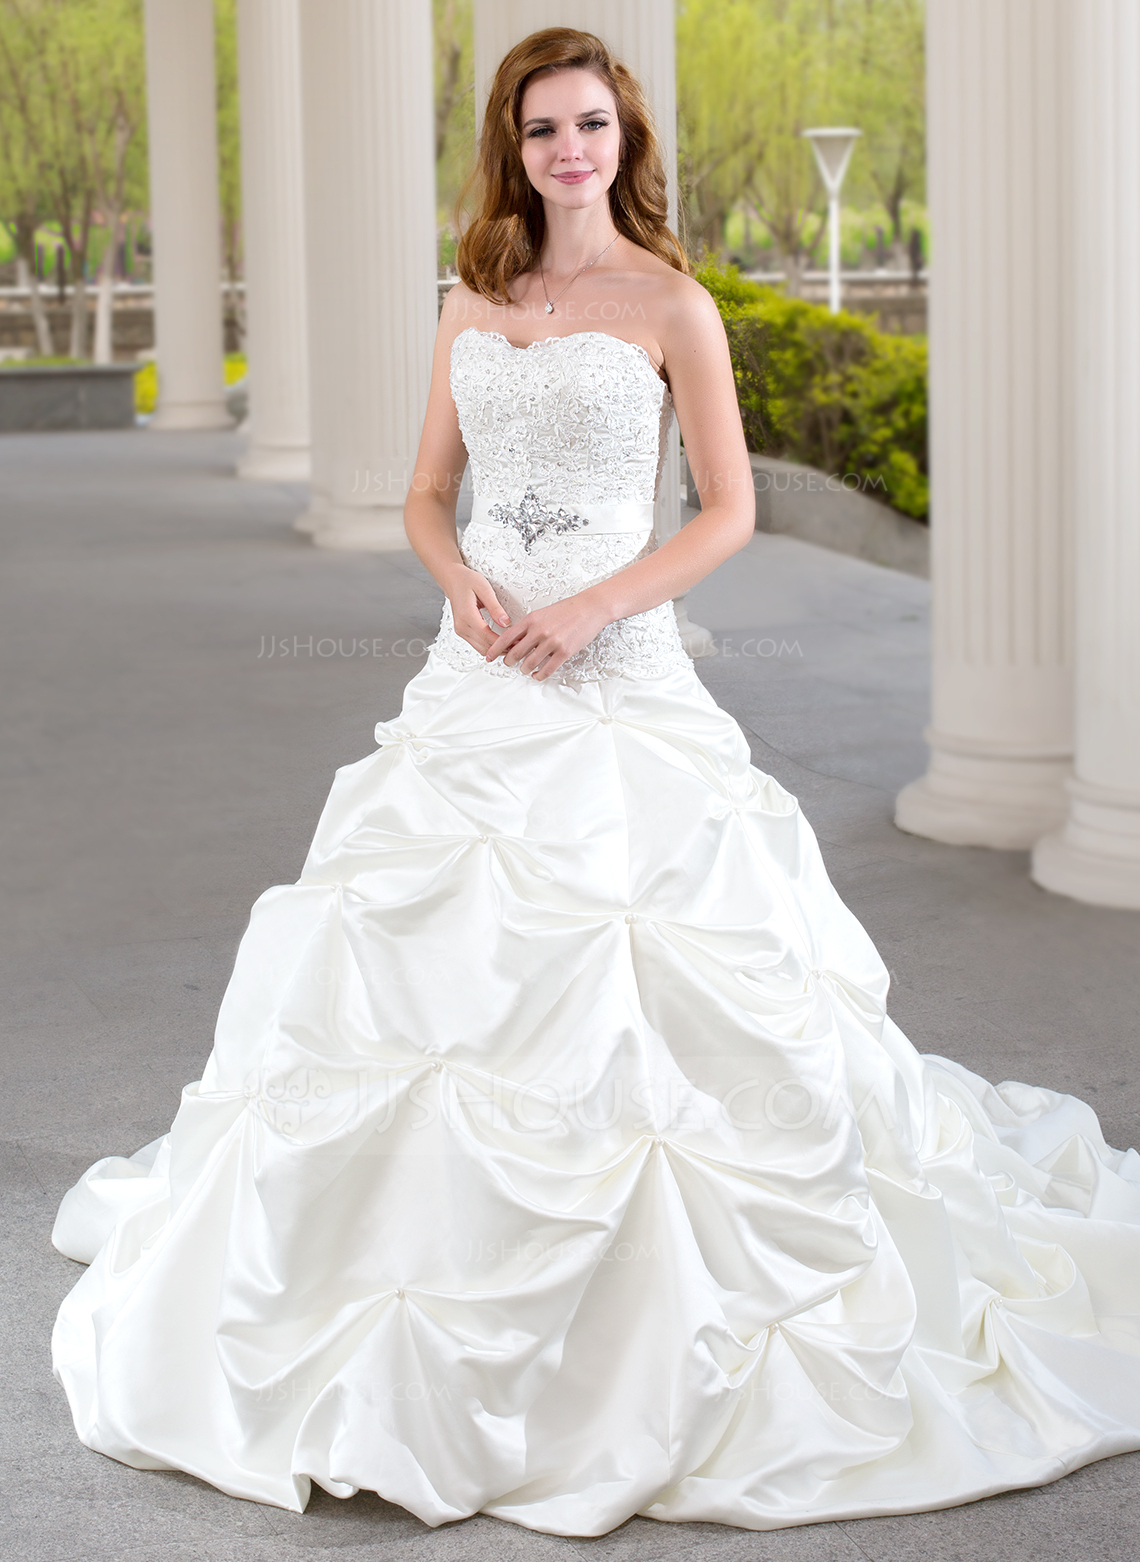 Ball Gown Sweetheart Chapel Train Satin Wedding Dress With Ruffle Lace Beading g jjshouse wedding dress Home Wedding Dresses Loading zoom